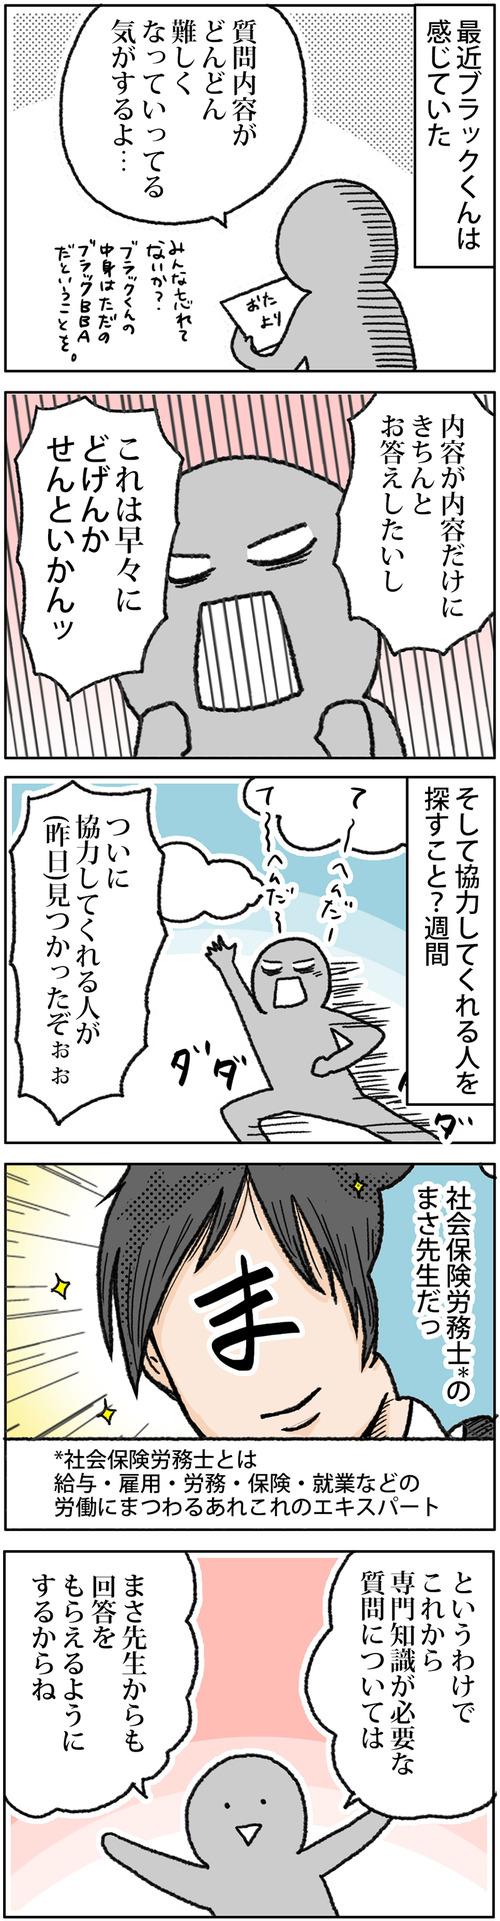 zangyo_171021_1